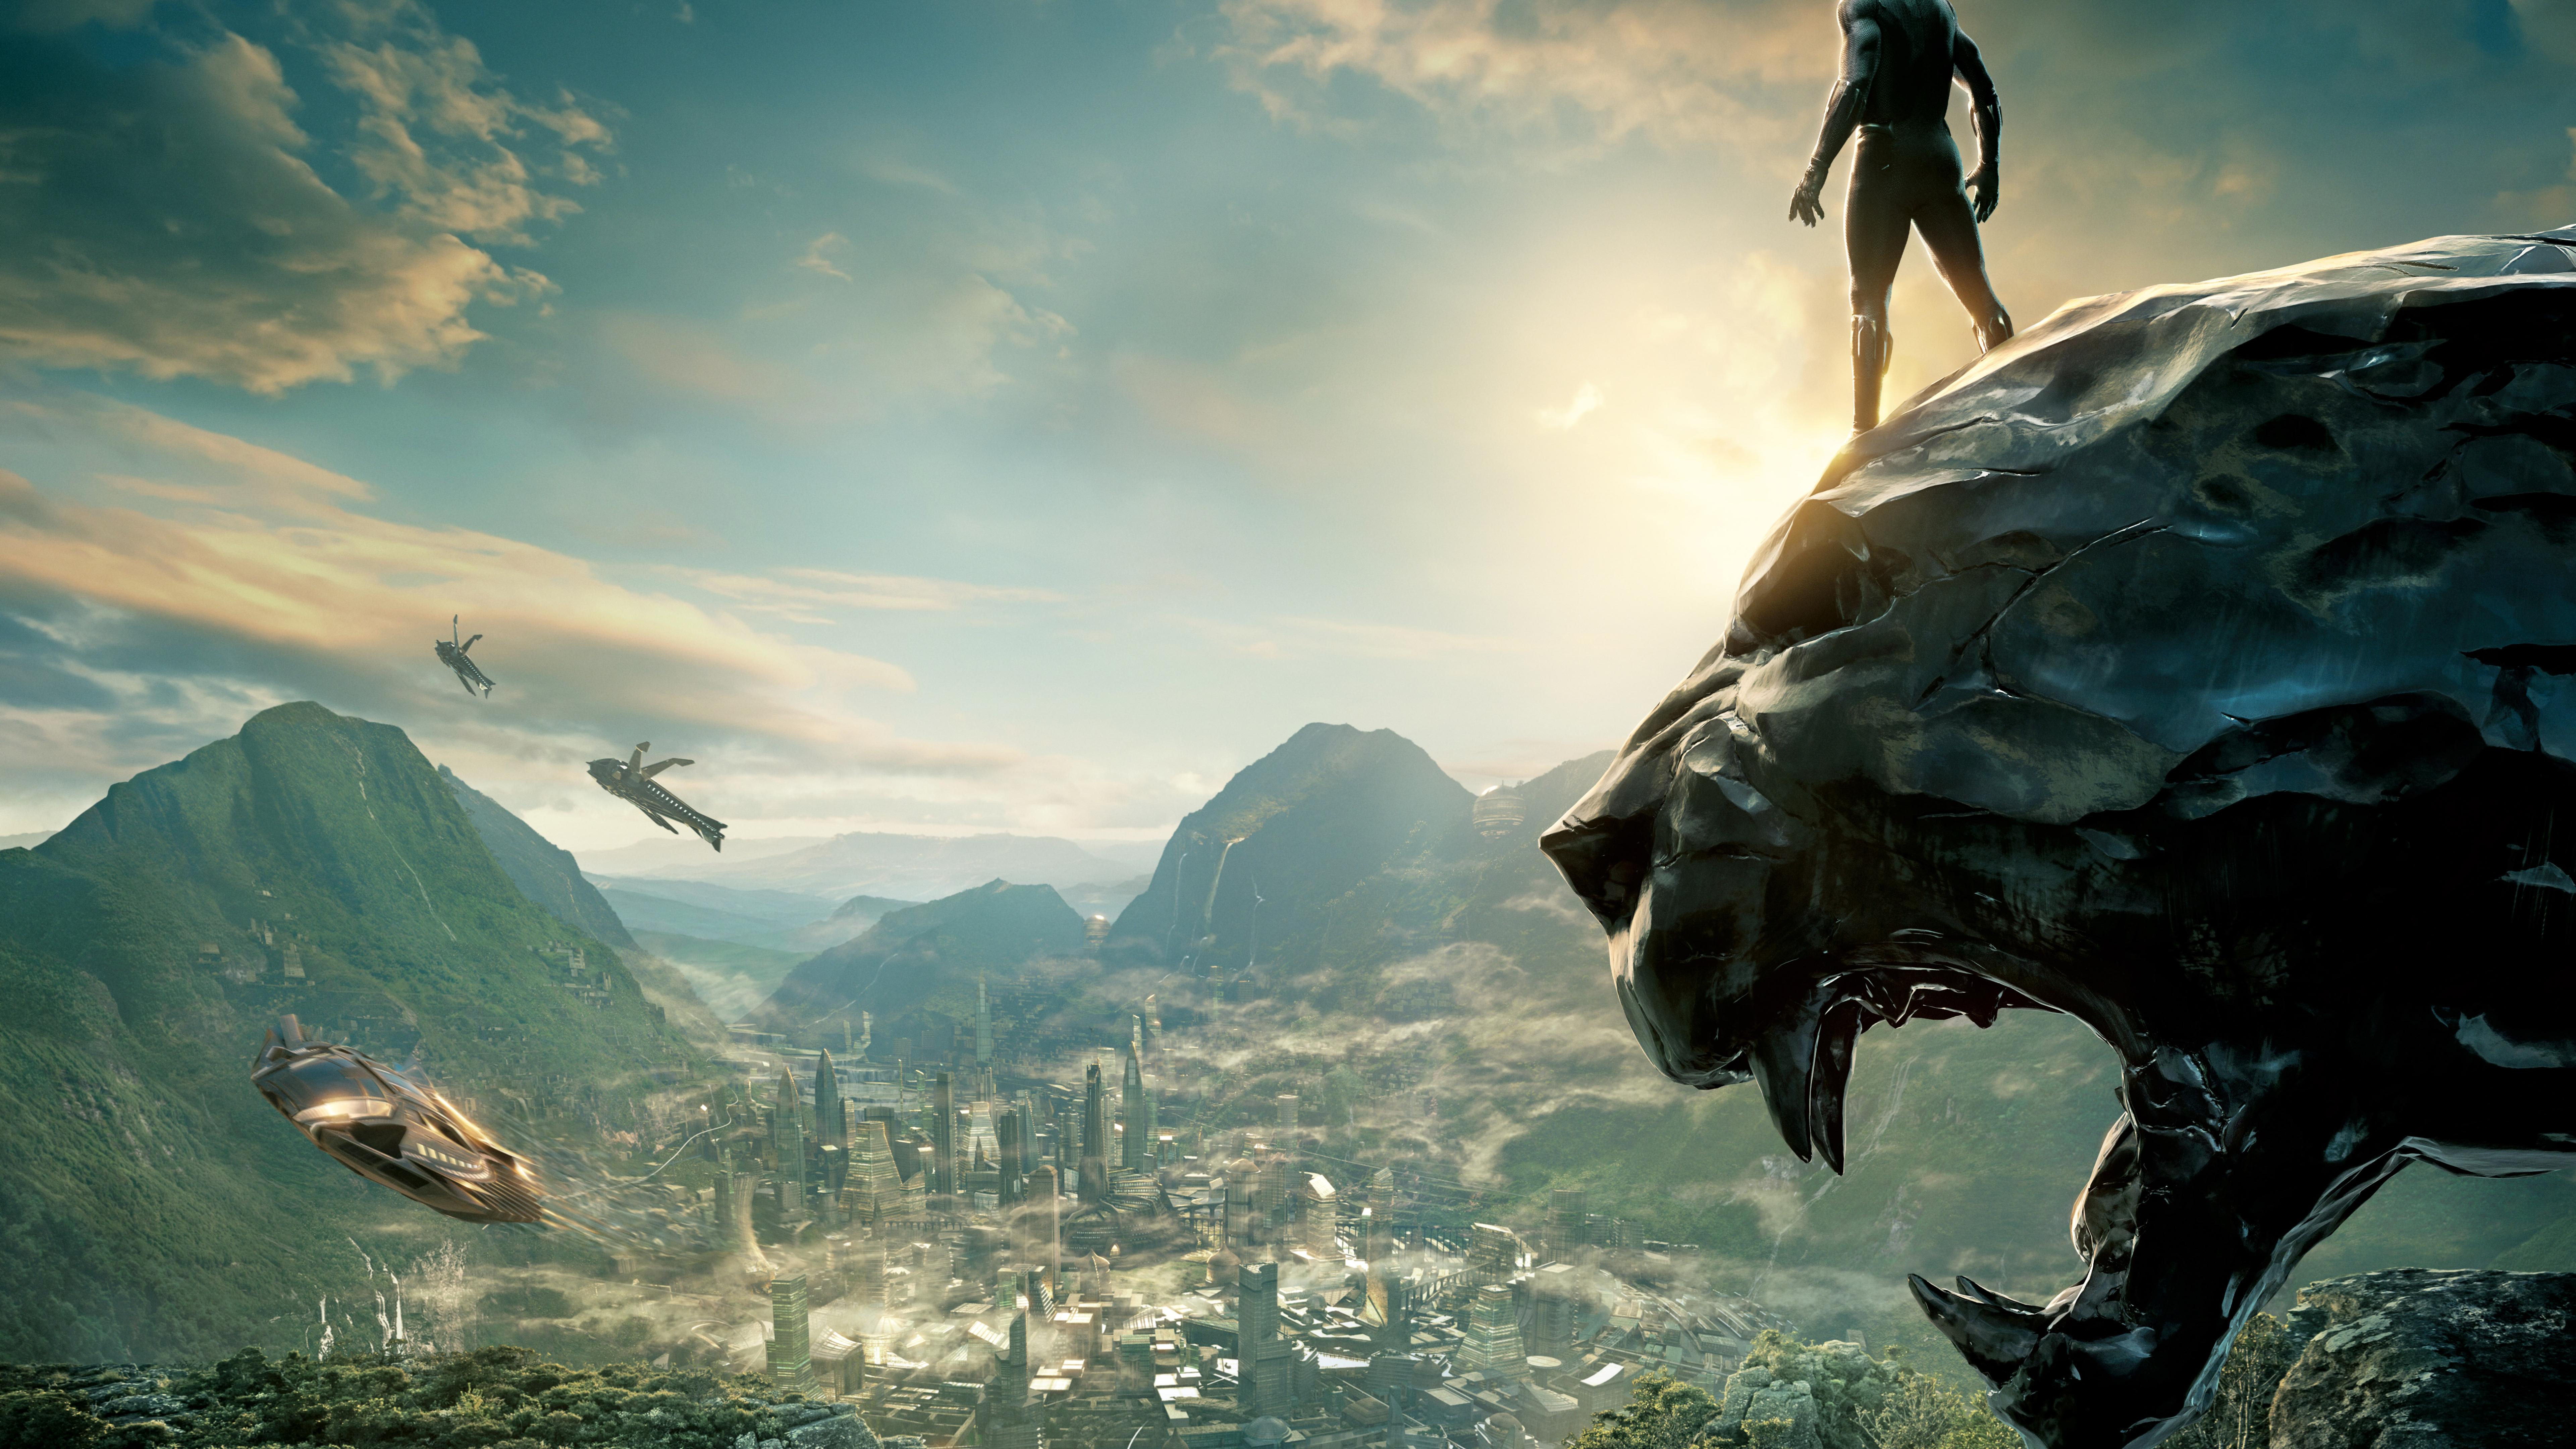 Black Panther 2017  Hd 8k Wallpaper